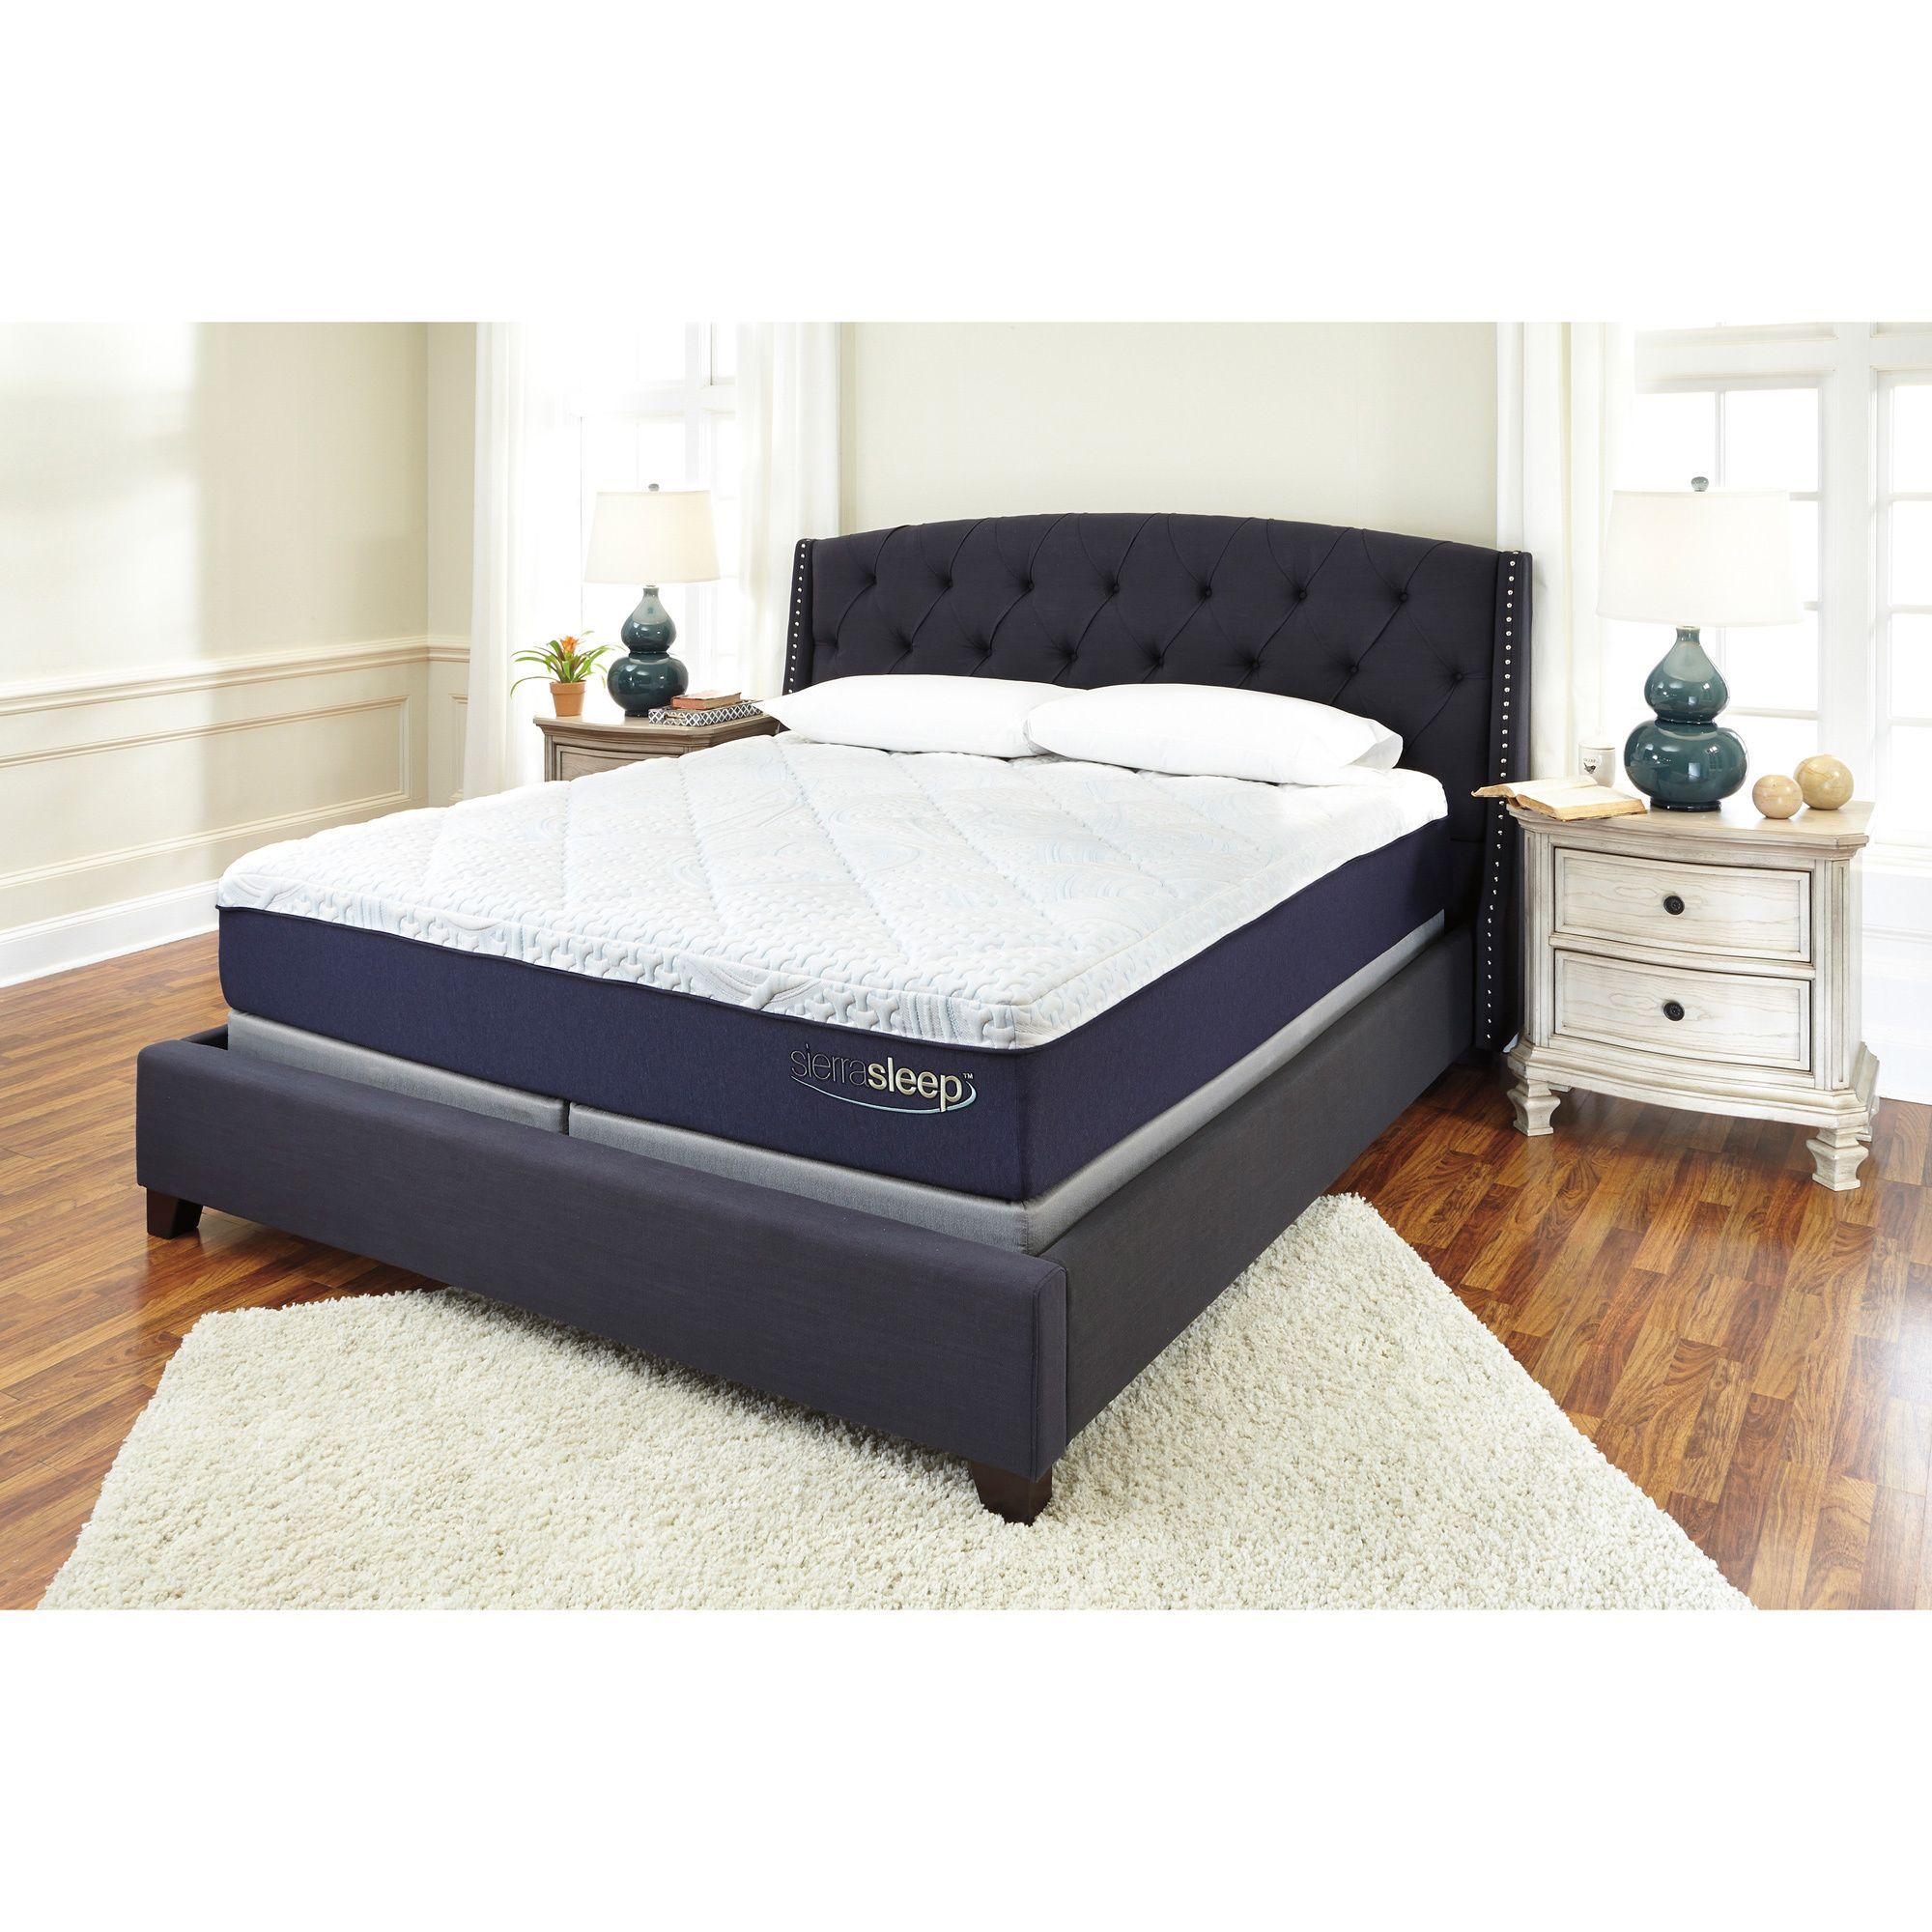 Sleep by Ashley 13 inch Queen size Gel Memory Foam Mattress Queen